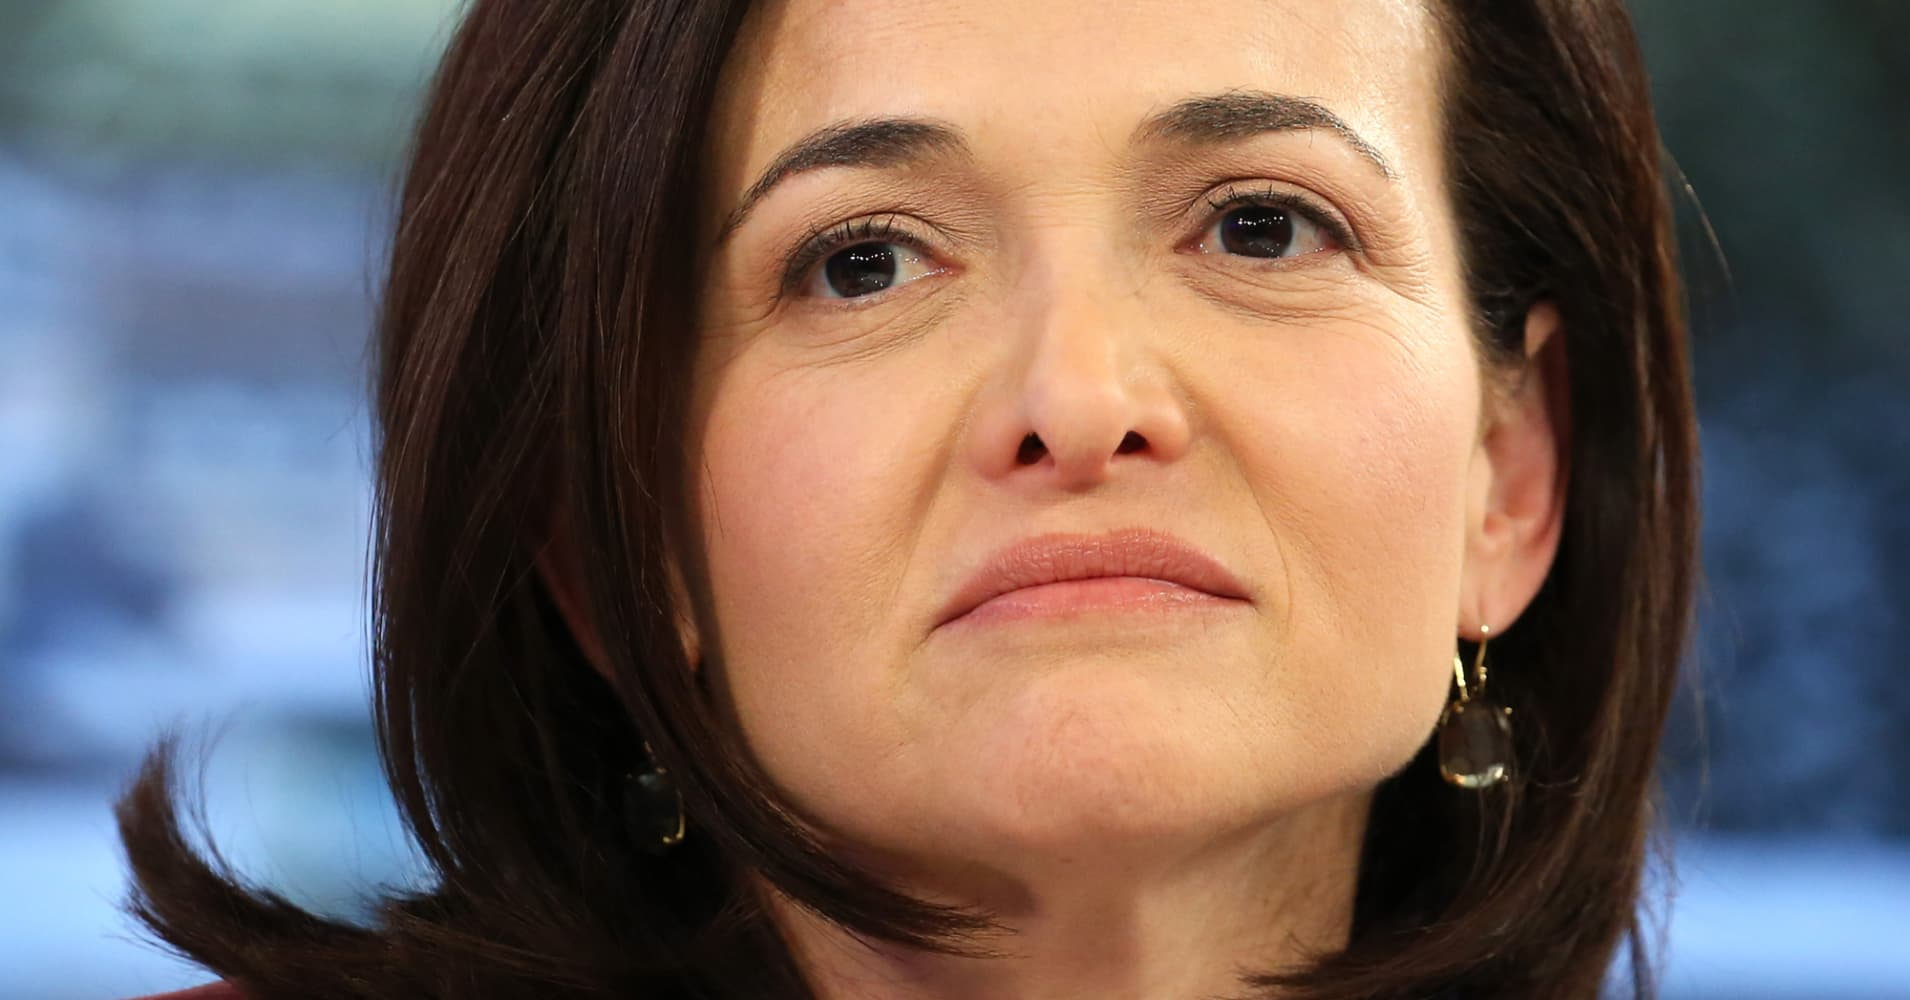 Mark Zuckerberg reportedly blamed Sheryl Sandberg as Facebook faced numerous scandals